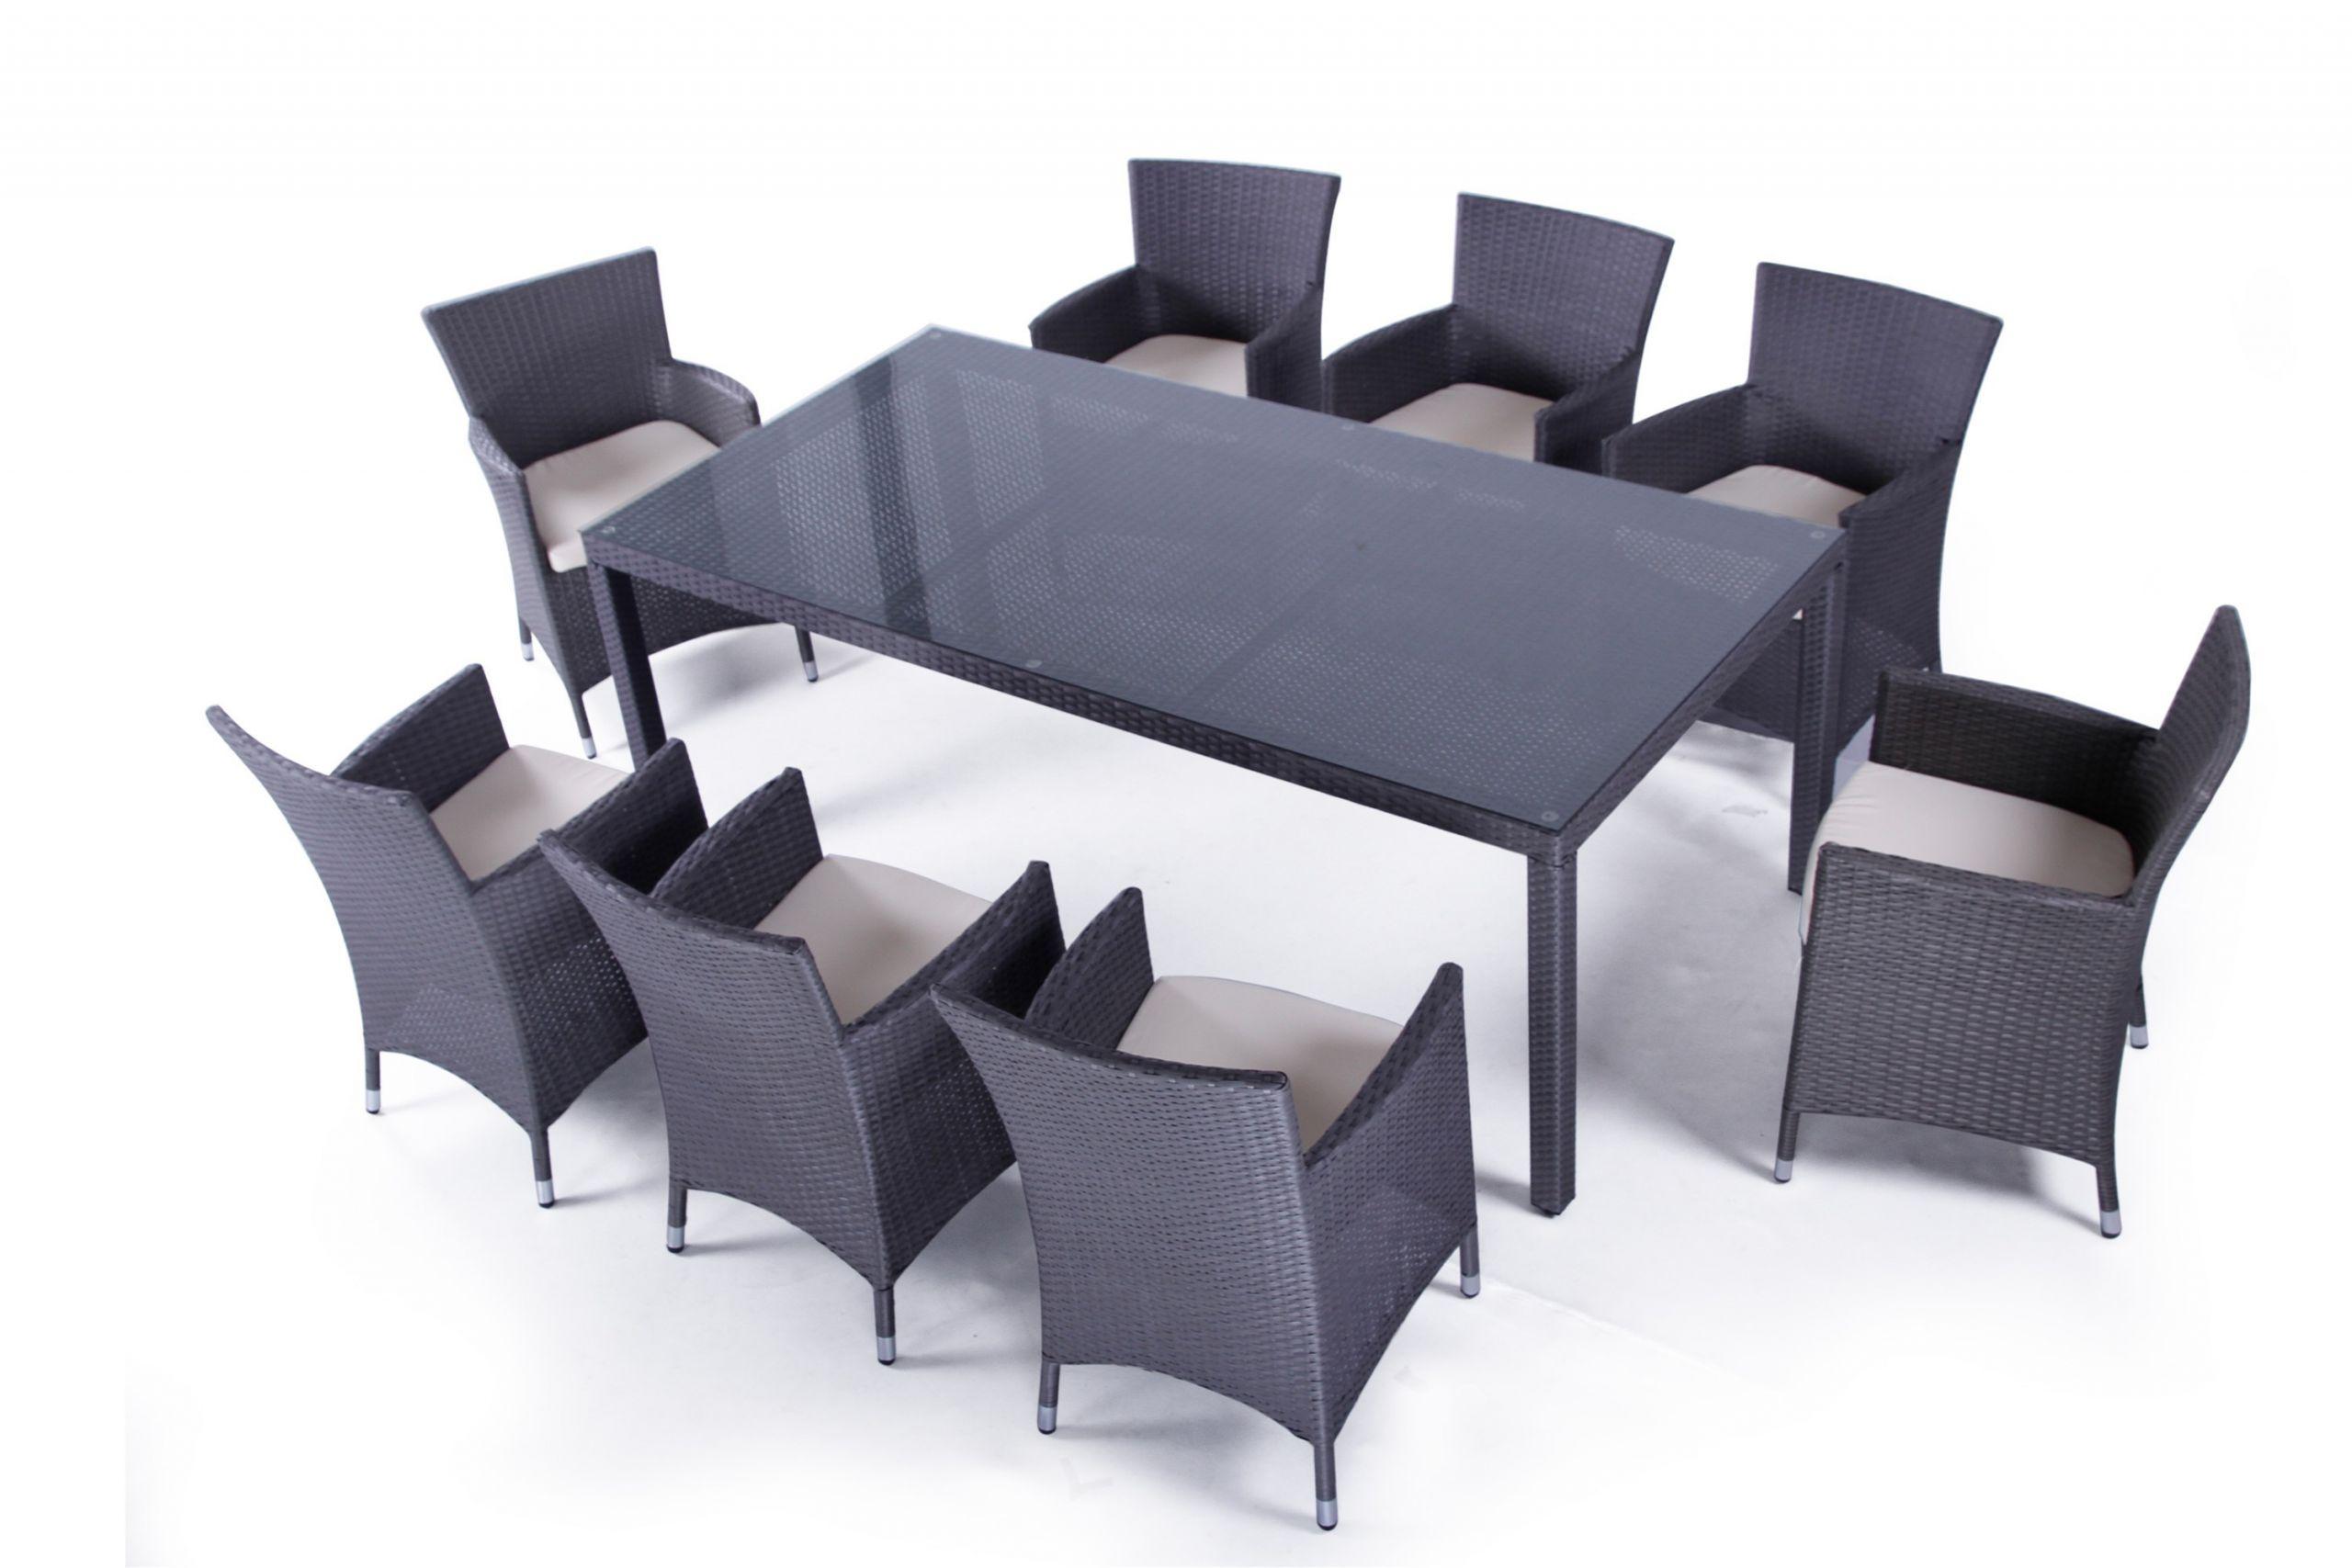 39 Best Of Tables Et Chaises De Jardin En Solde | Salon Jardin à Table Et Chaises De Jardin Pas Cher